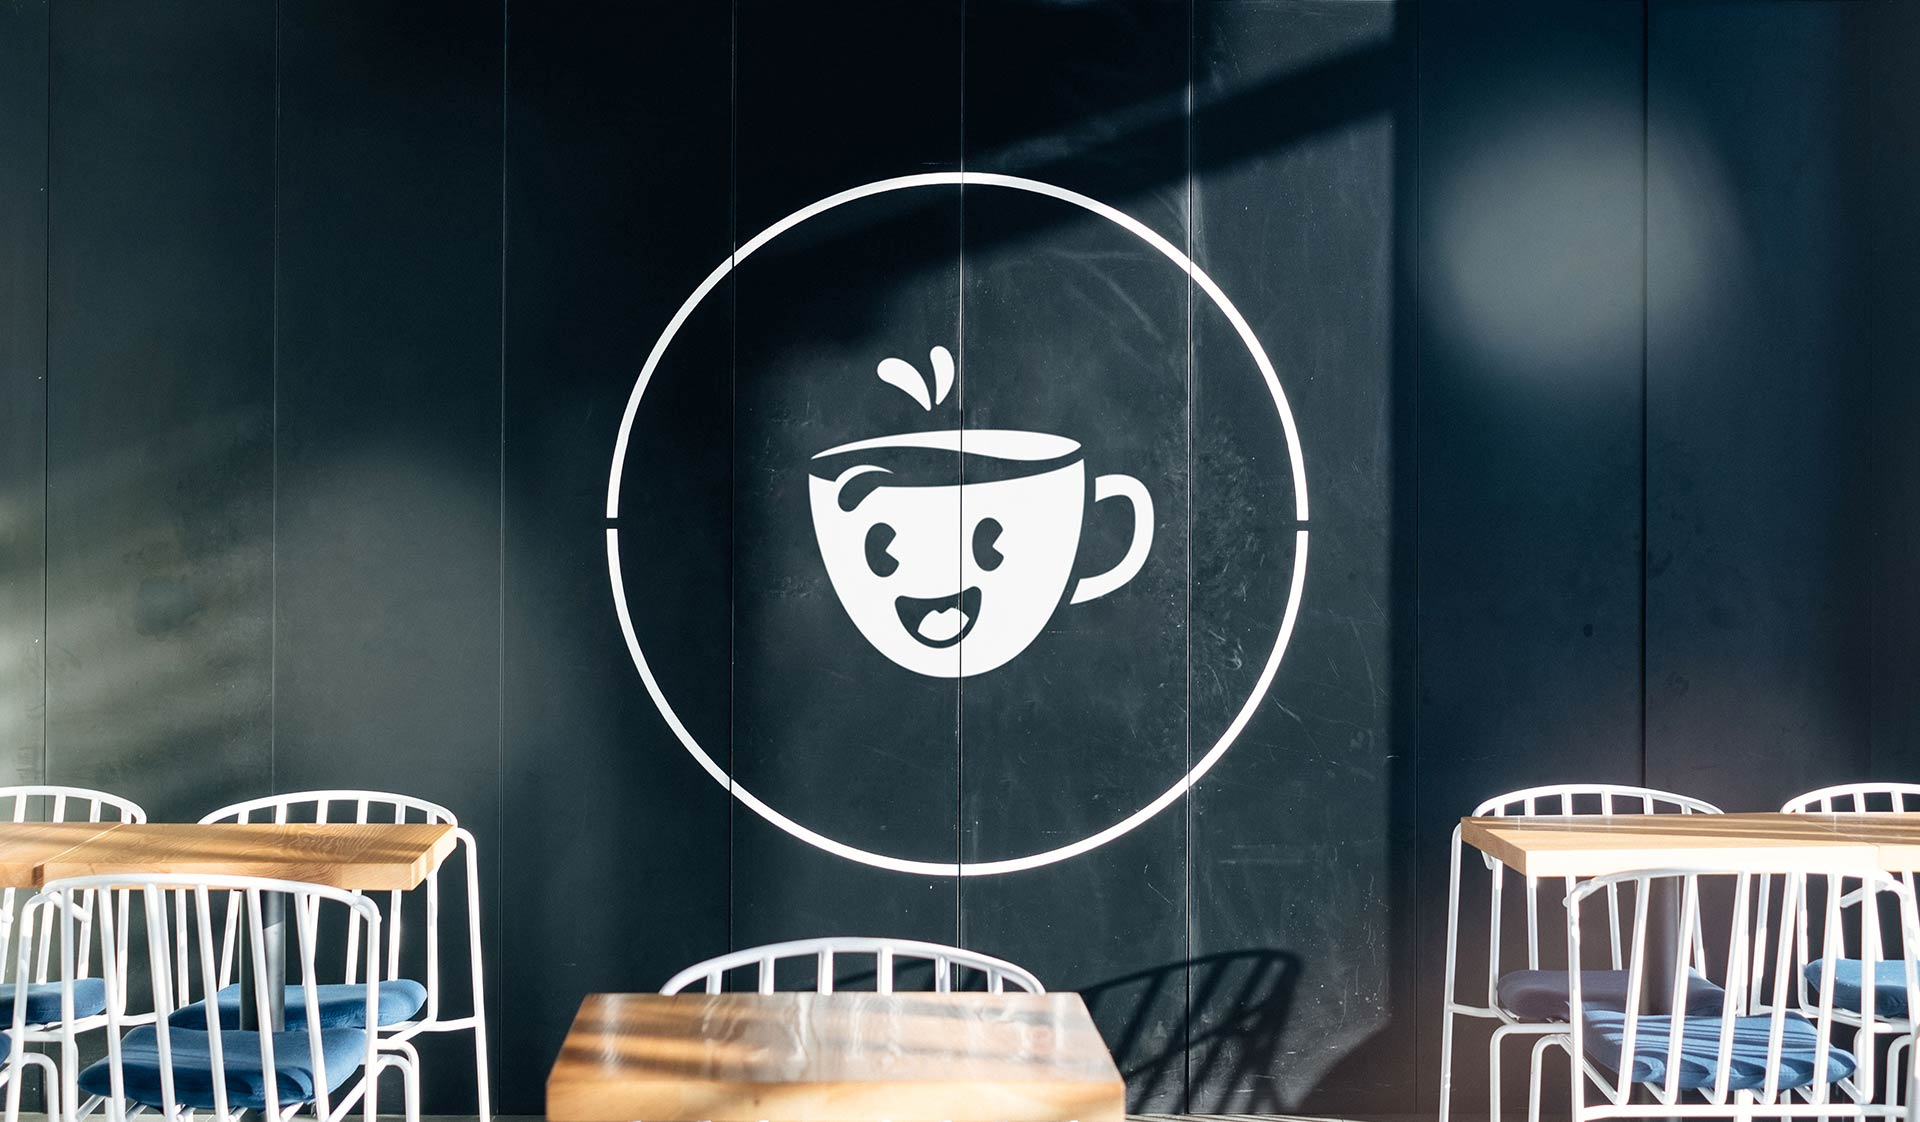 https://theory.agency/wp-content/uploads/2020/03/theory-agency-cafe-debang-logo-design-02.jpg